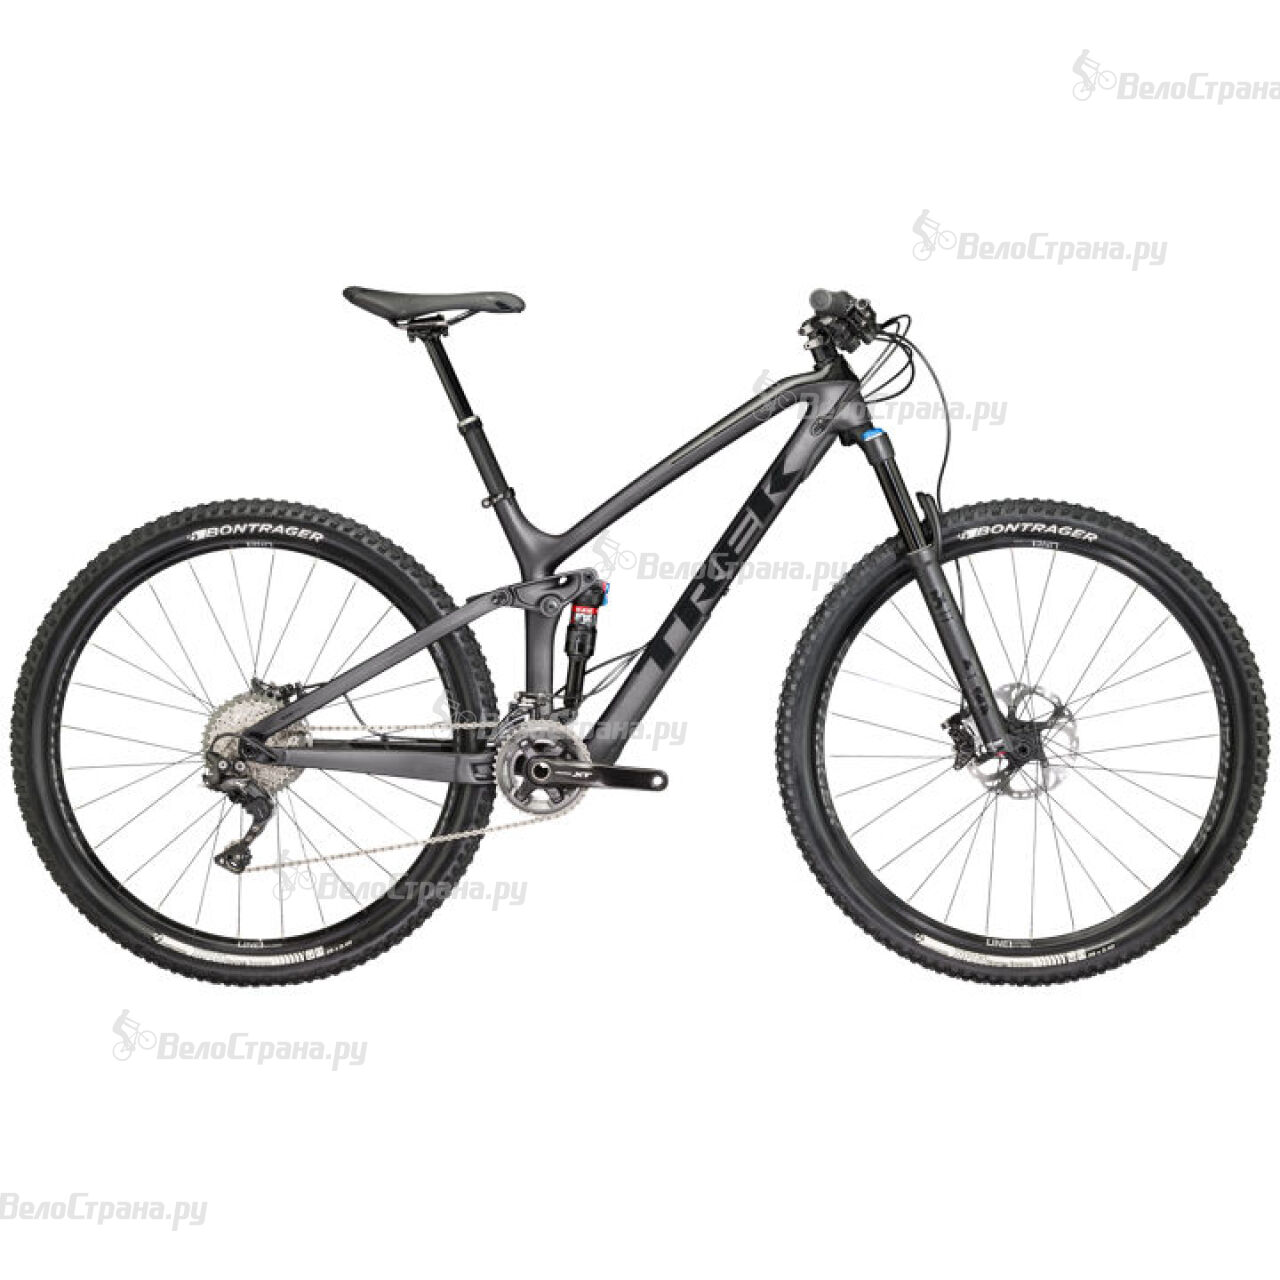 Велосипед Trek Fuel EX 9.8 29 (2017) trek fuel ex 9 27 5